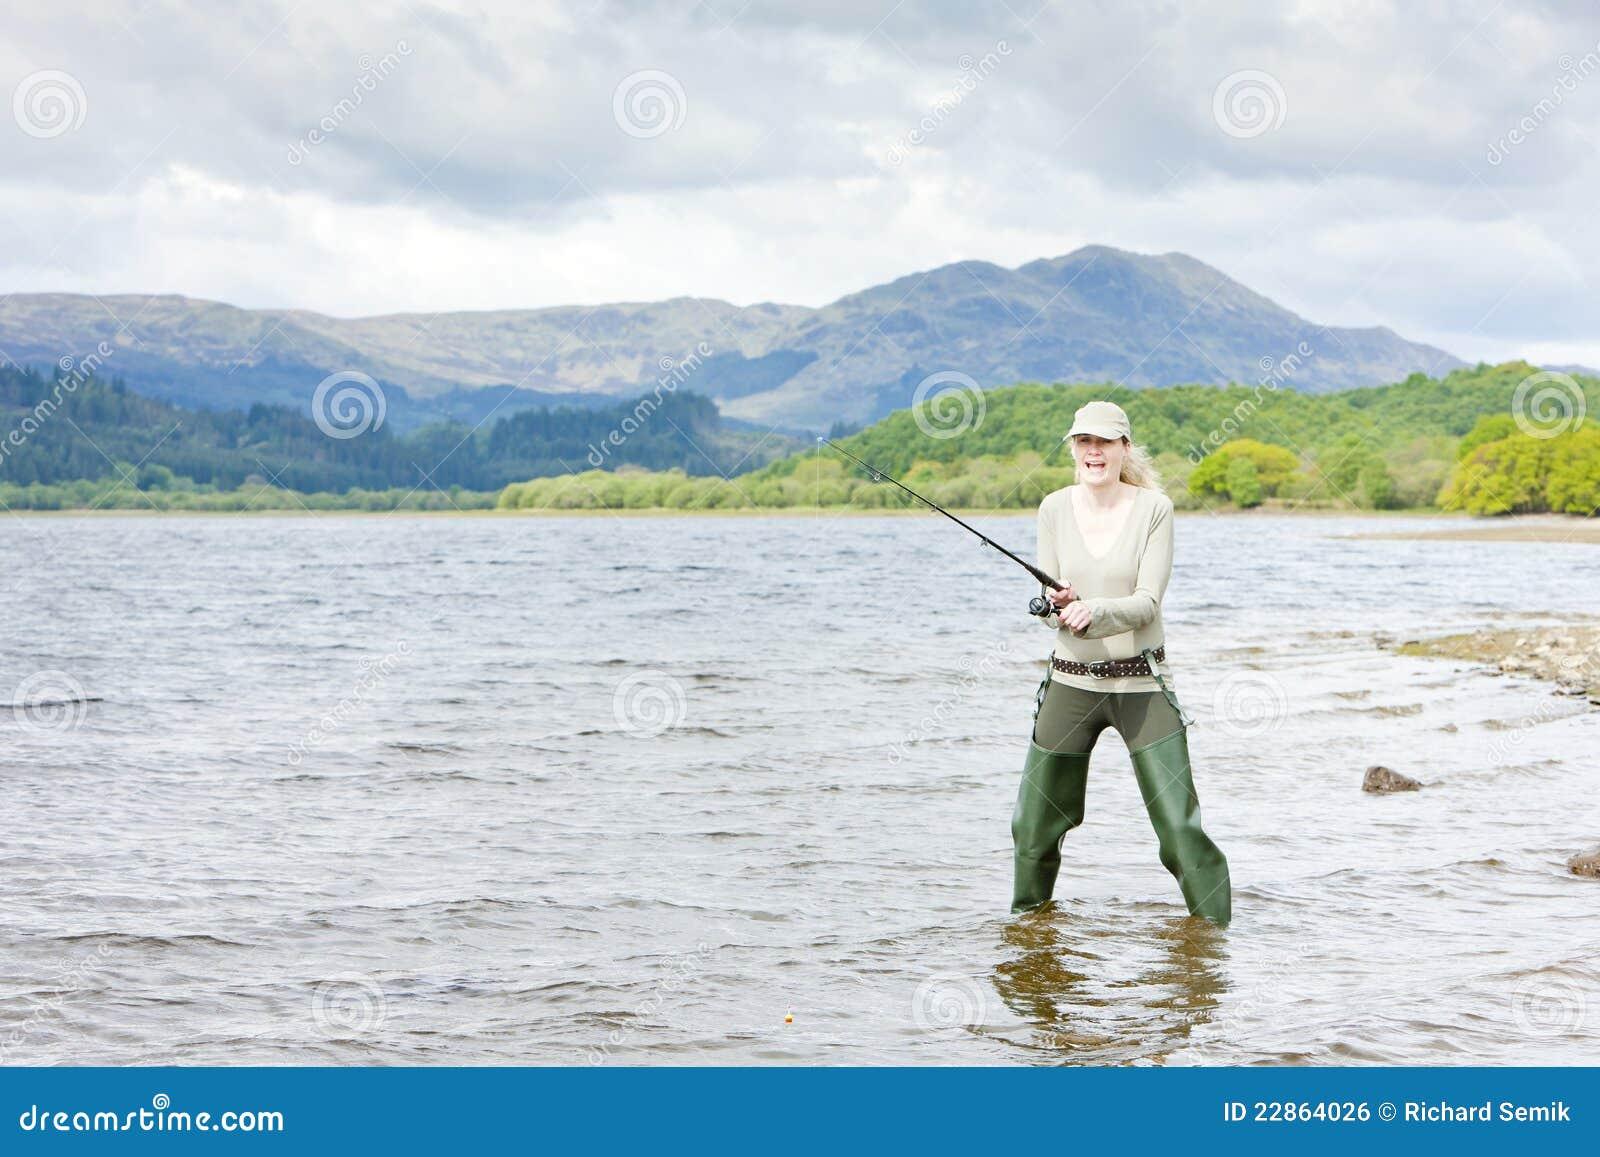 Fishing Woman Royalty Free Stock Image - Image: 22864026